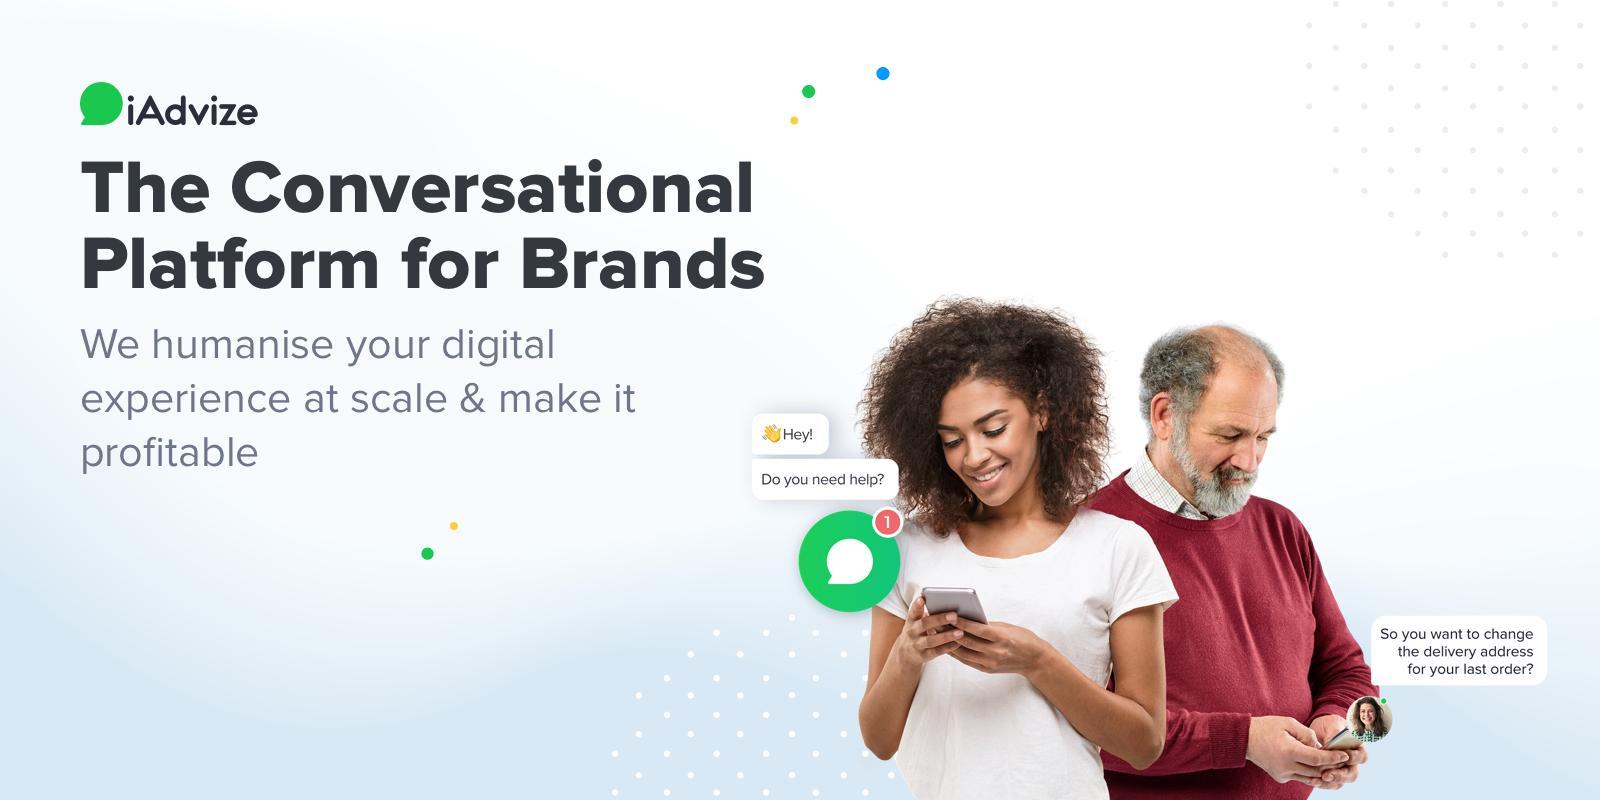 Opiniones iAdvize: Líder europeo en soporte al cliente para e-commerces - Appvizer